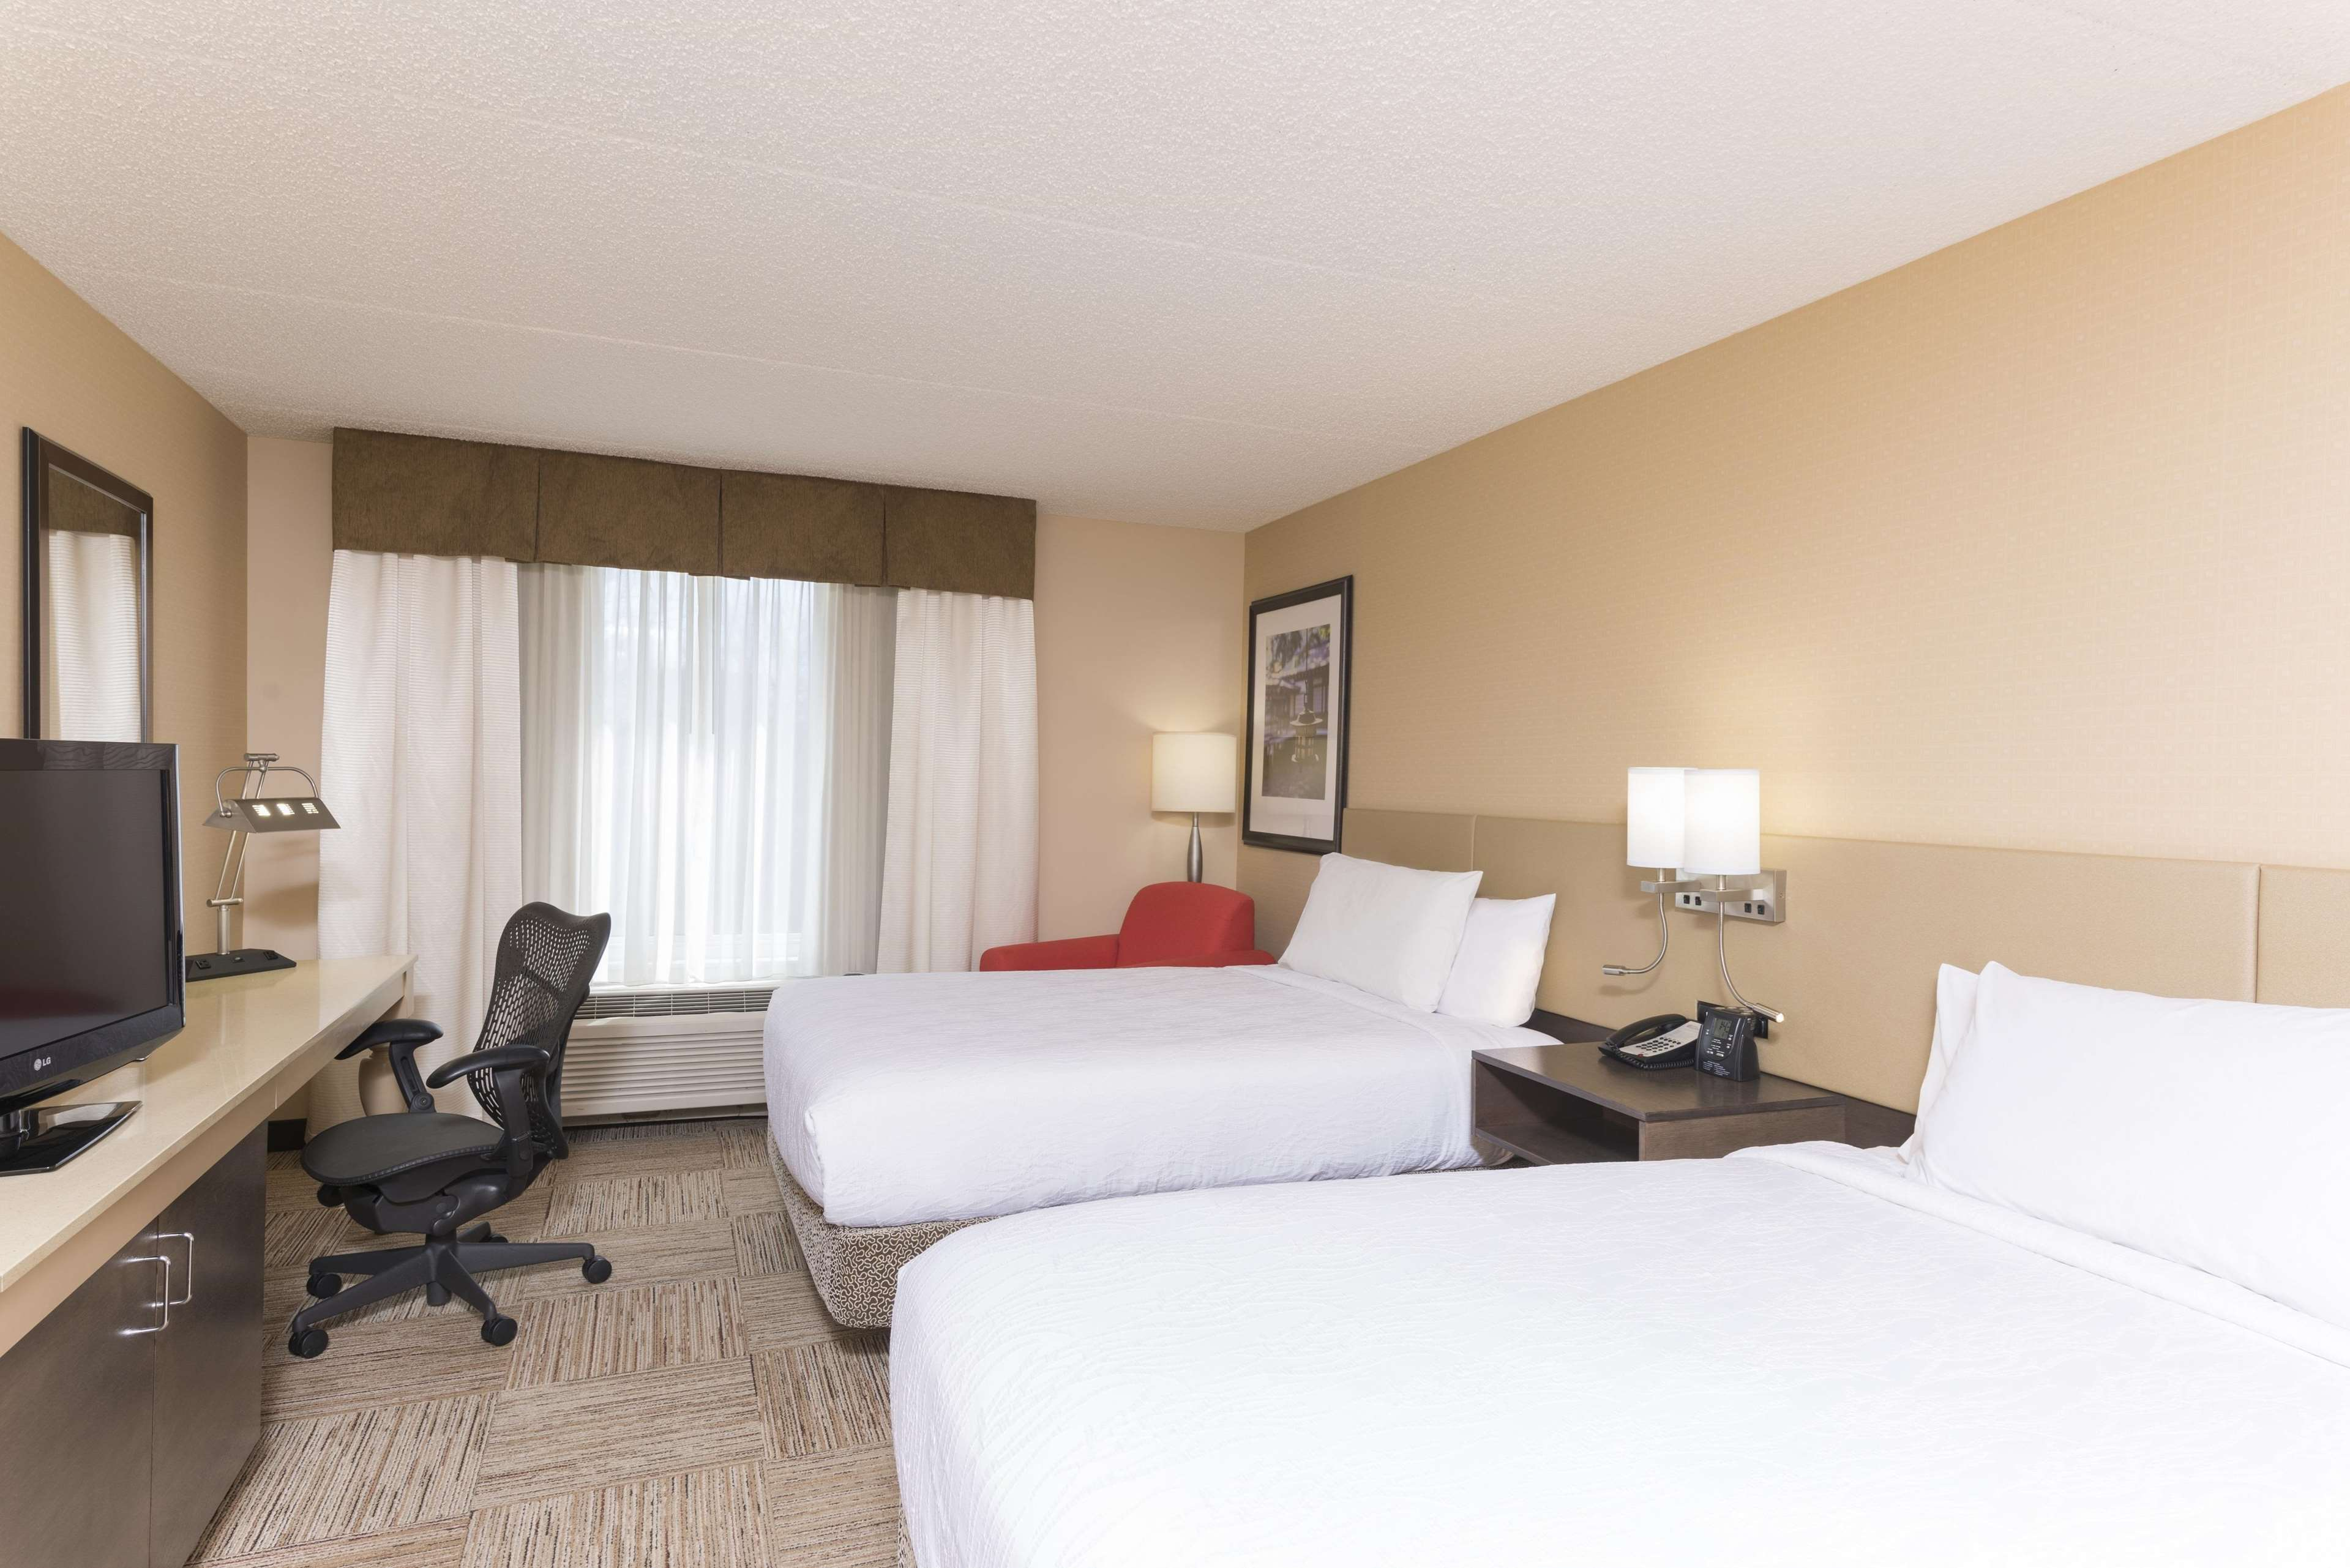 Hilton Garden Inn West Lafayette Wabash Landing image 20